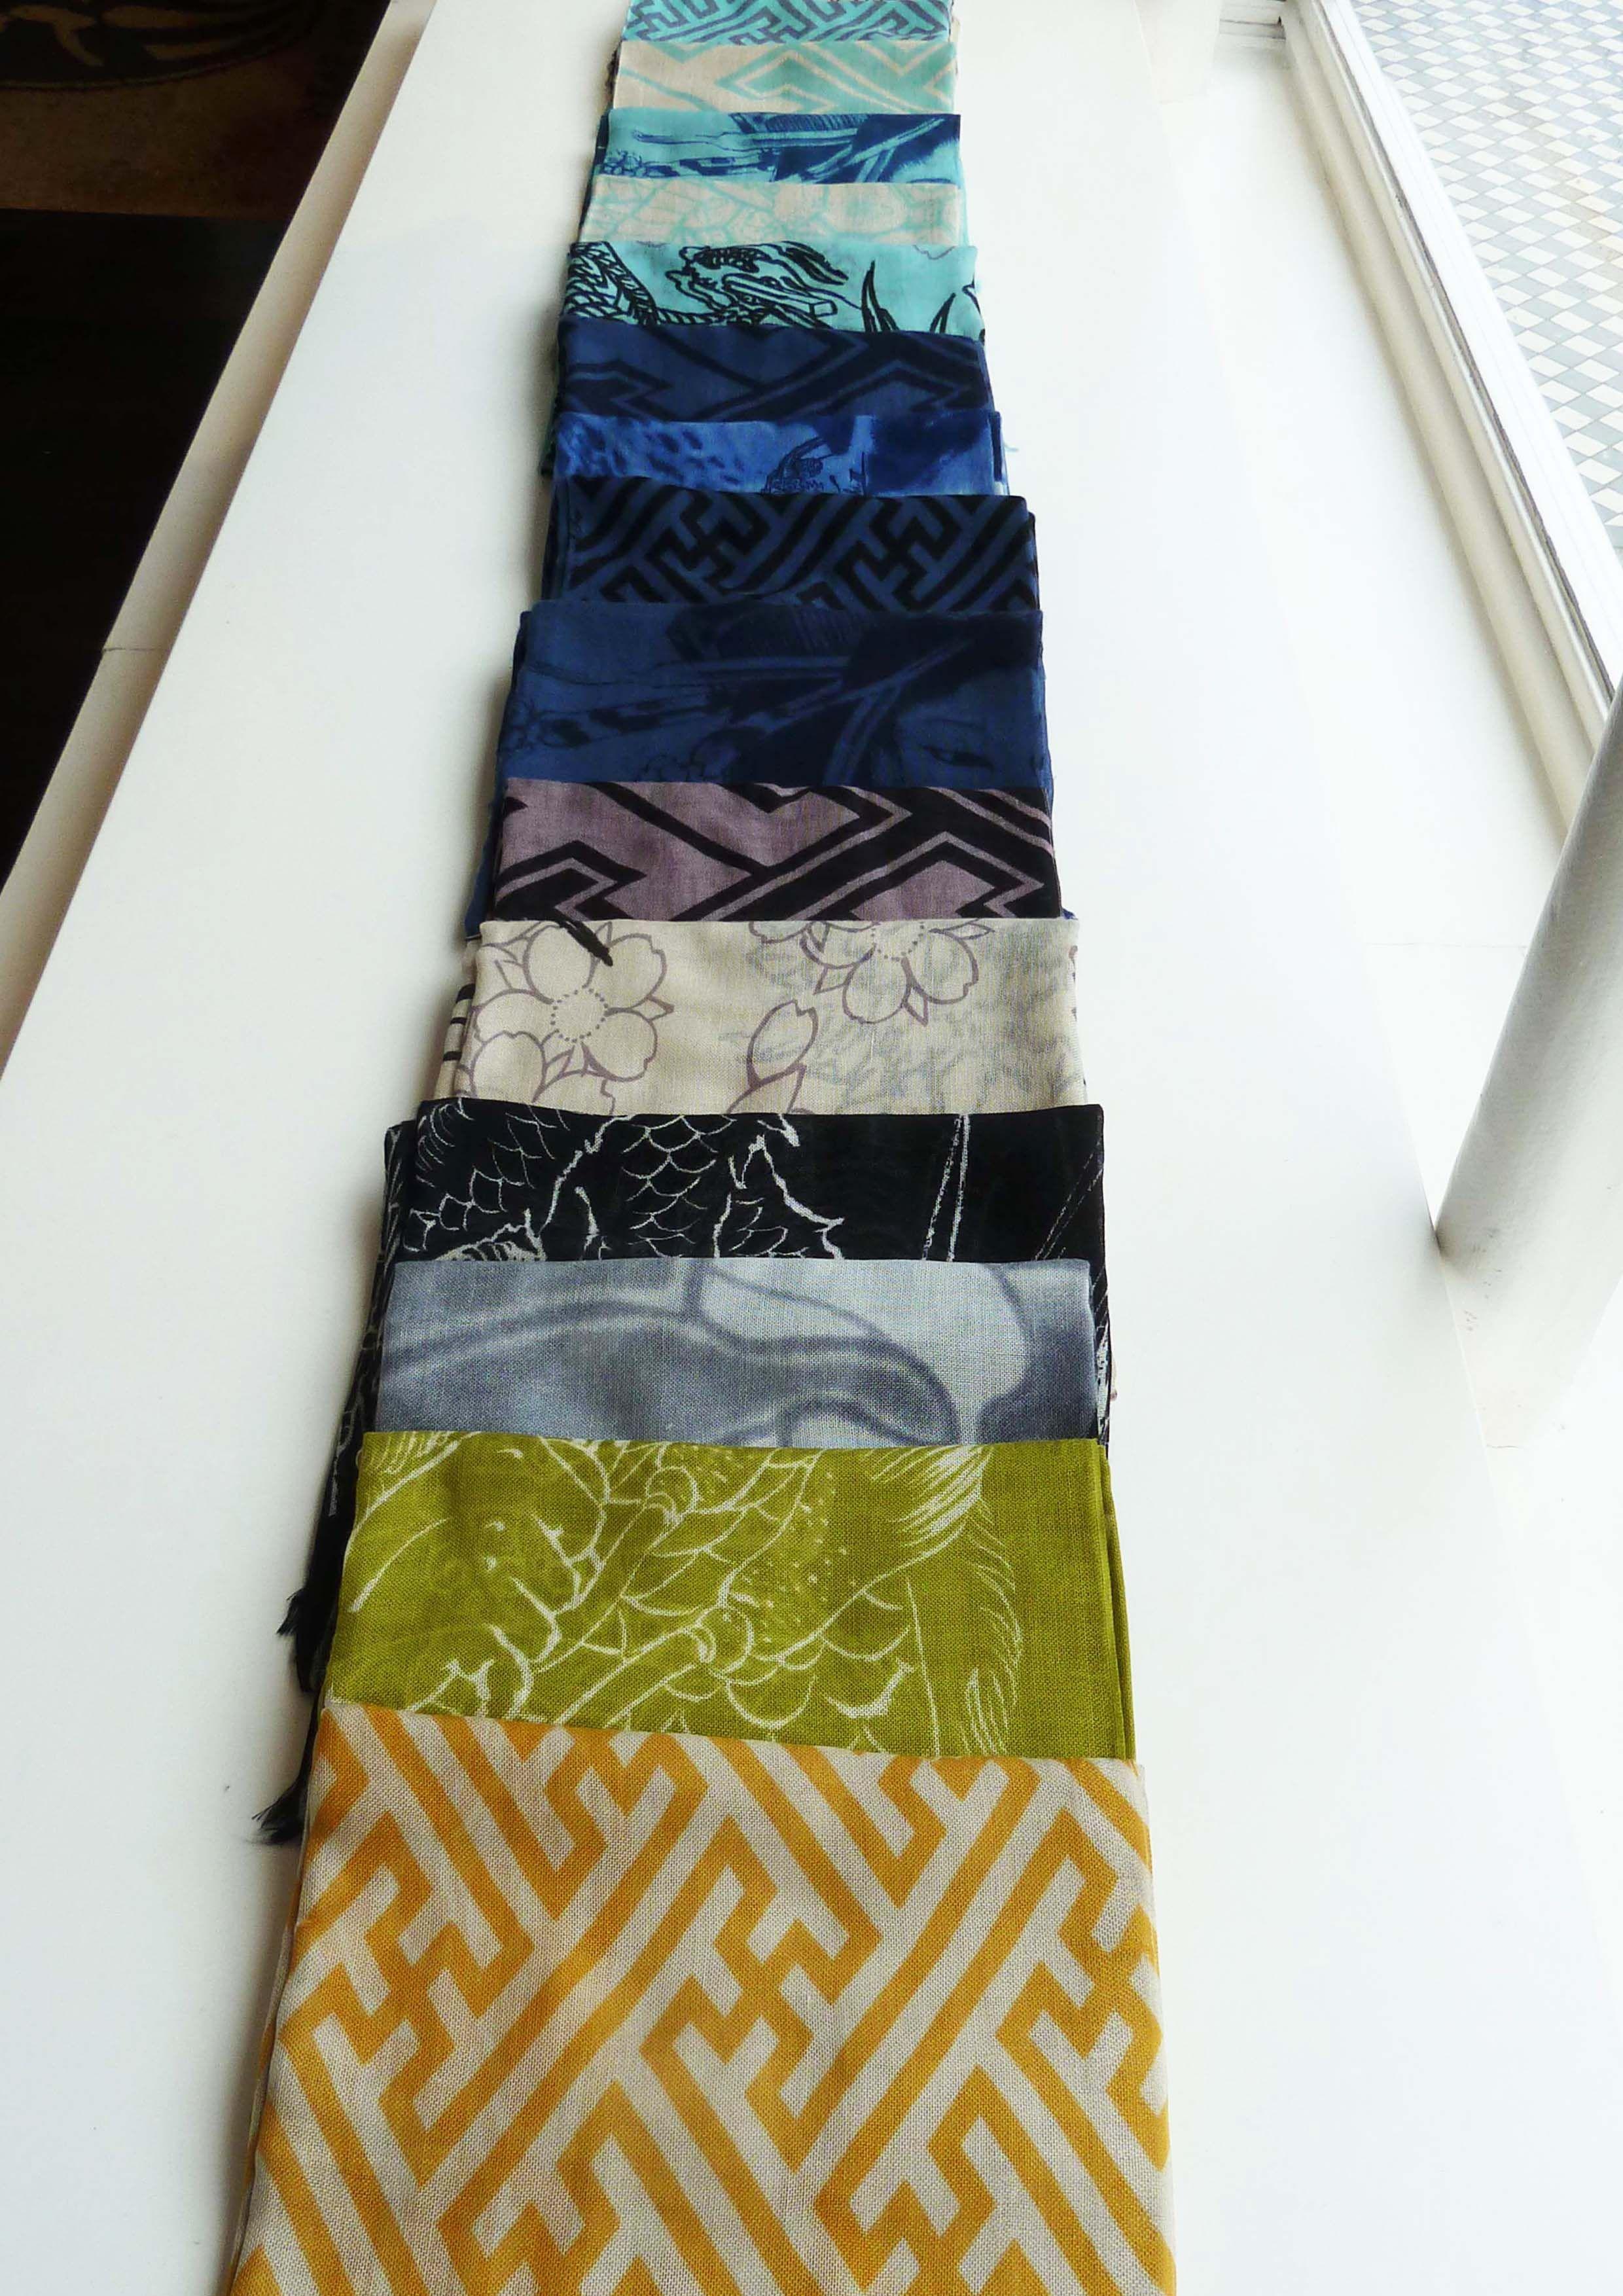 Spring Summer 12 scarves in aqua, avocado, denim, almond and black